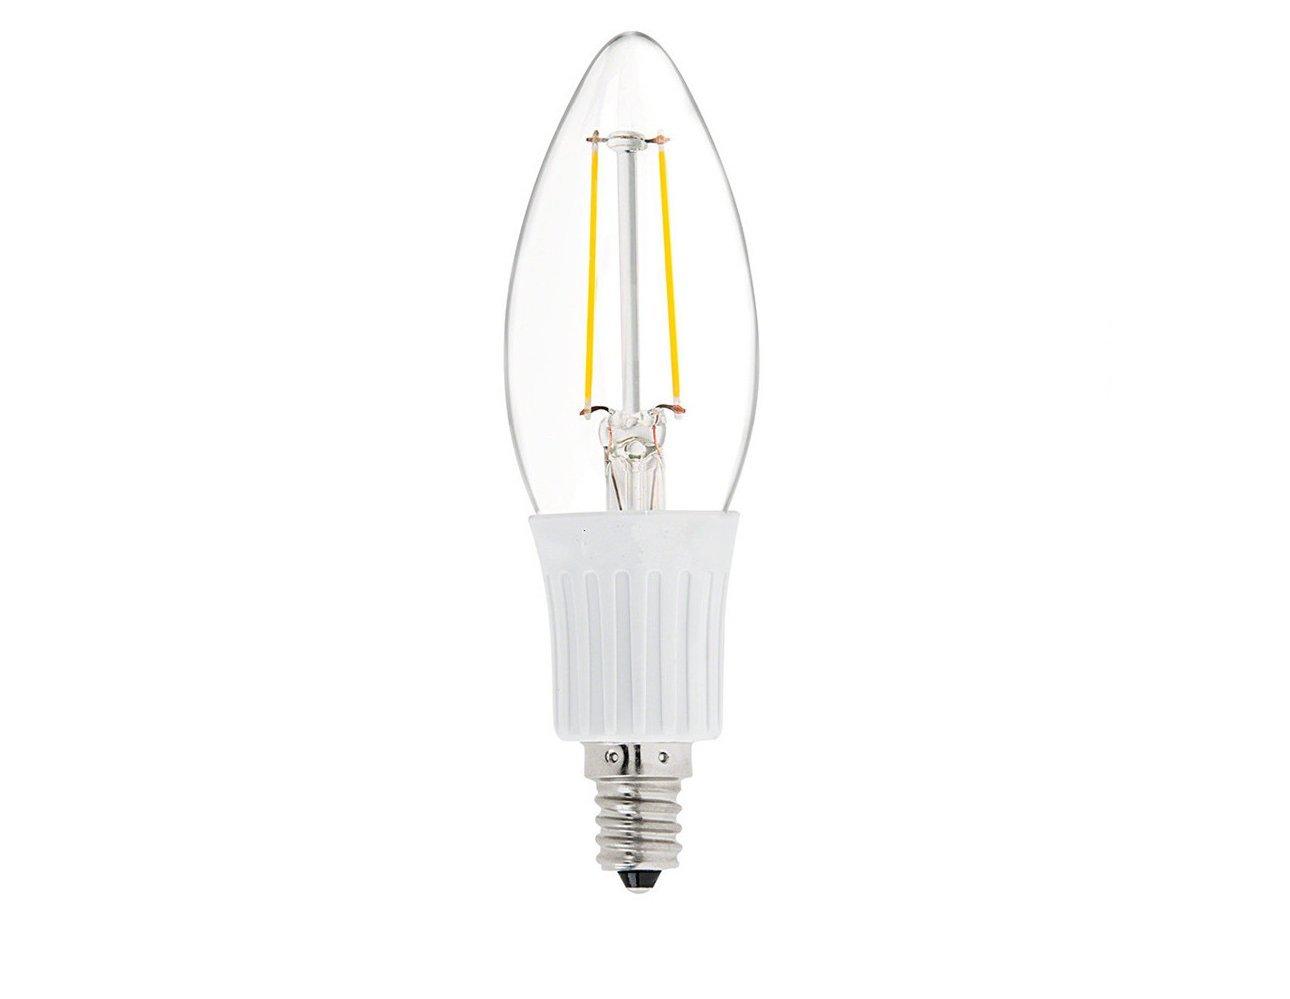 DC 12 Volt C35 E12 Warm White 2700K 2 Watt LED Filament Light Bulb MES Mini Screw Base Lamp Low Voltage Ikea Desk Top Outdoor Outside Landscape Machine Room Chandelier Pendant Night Lighting